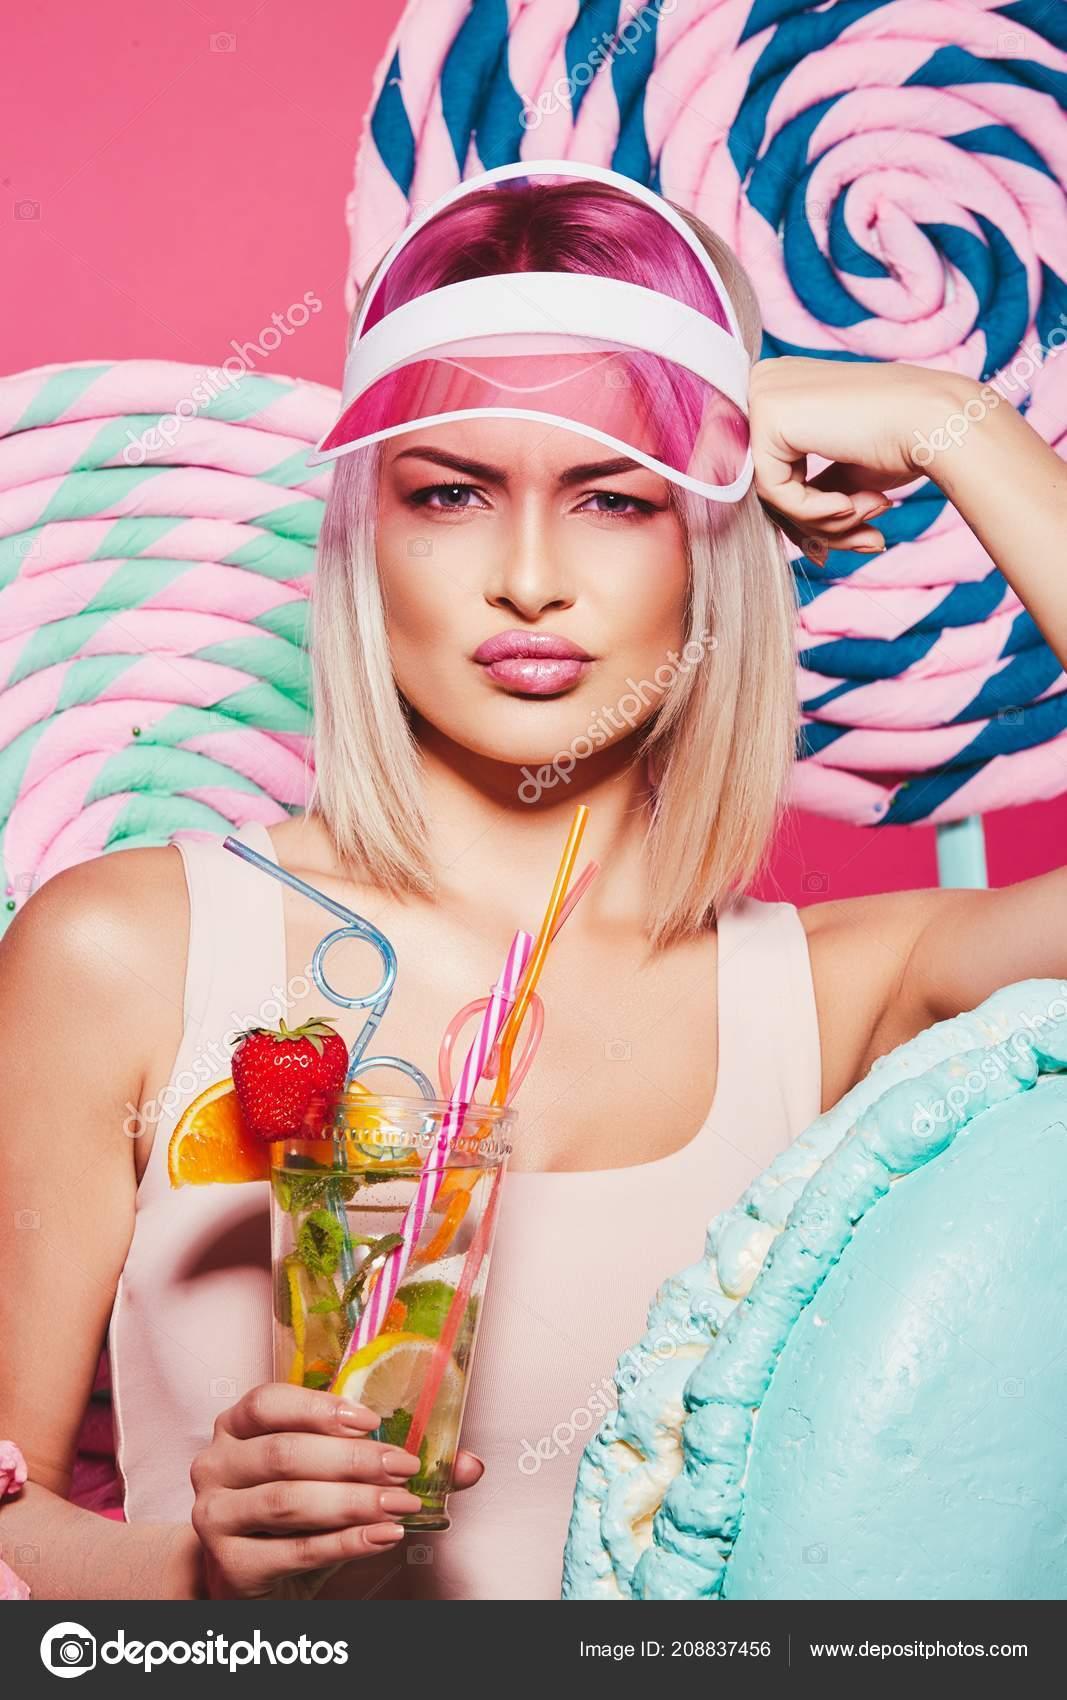 Pretty Girl Blonde Hair Wearing Top Pink Cap Eating Strawberry